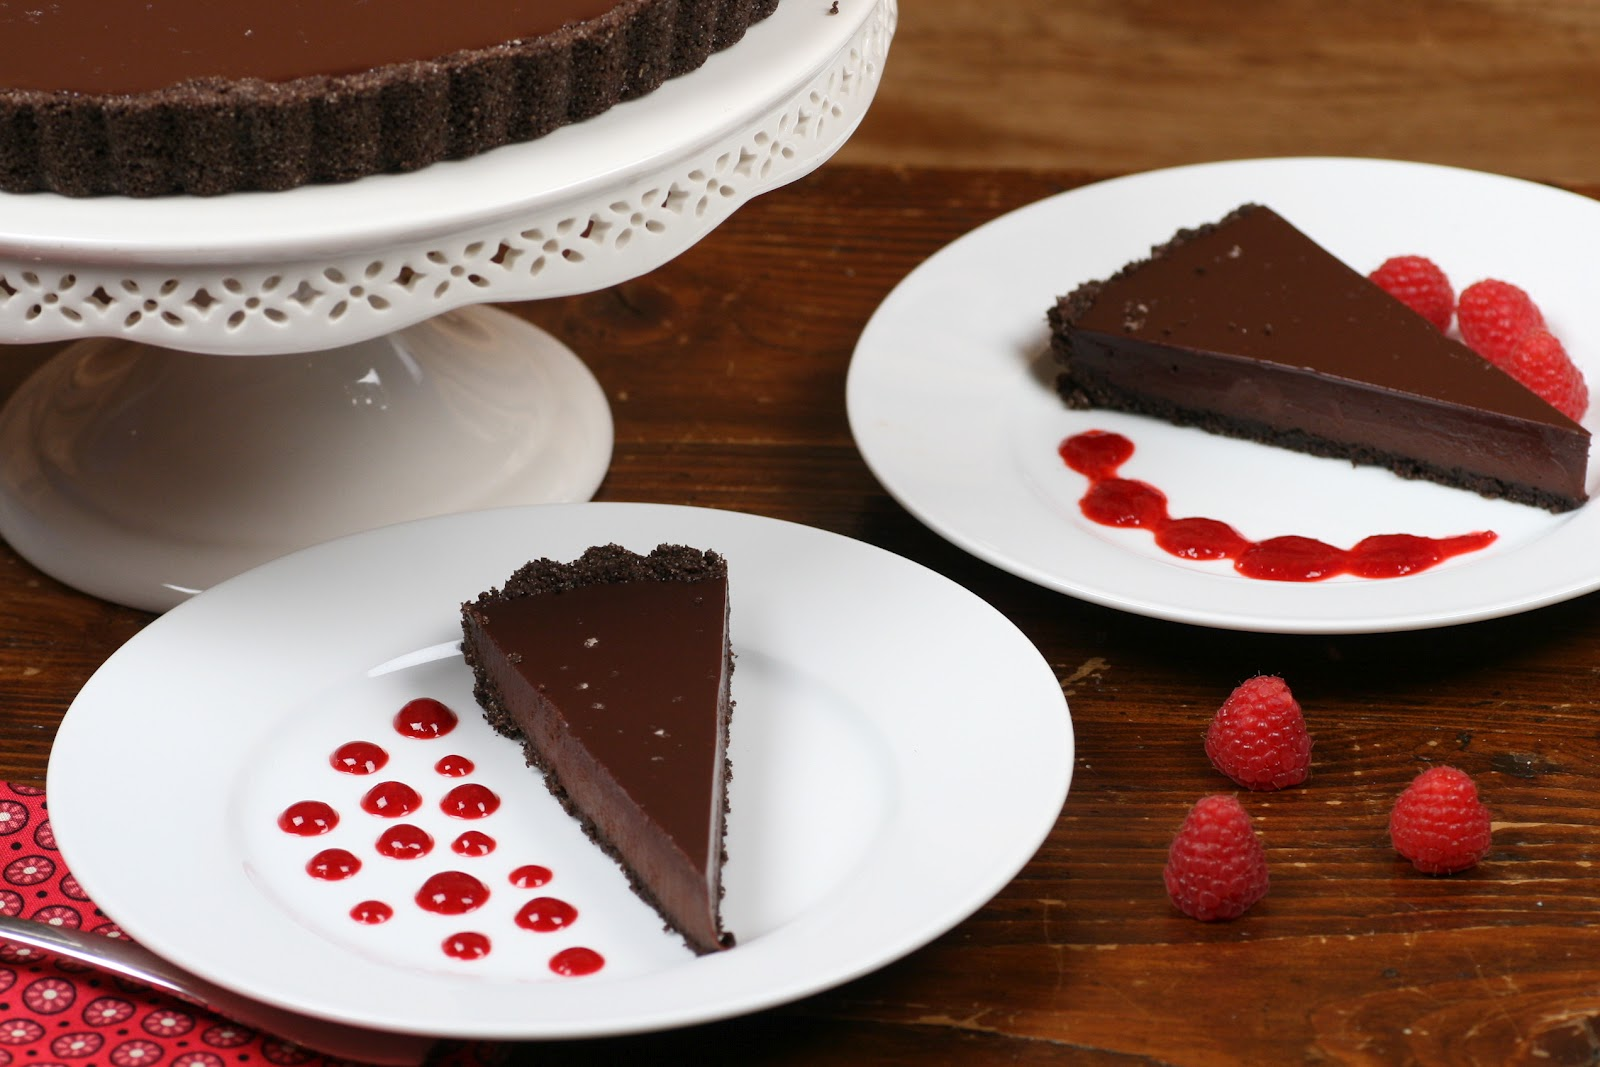 here is the recipe: Chocolate Glazed Chocolate Tart